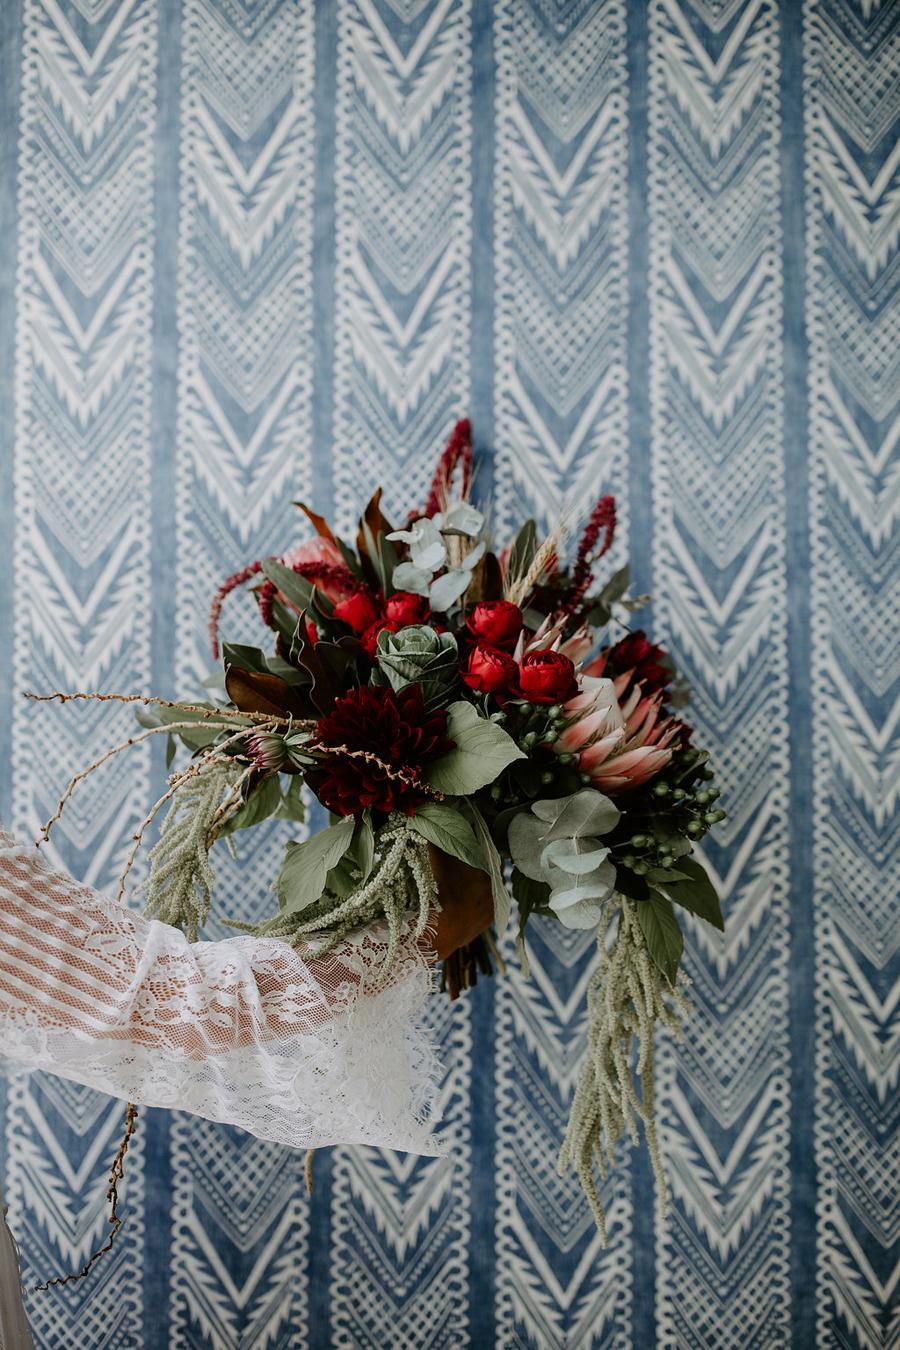 osteria-casuarina-wedding-venue-tweed-coast-weddings-coastal-garden-reception-real-wedding003.jpg